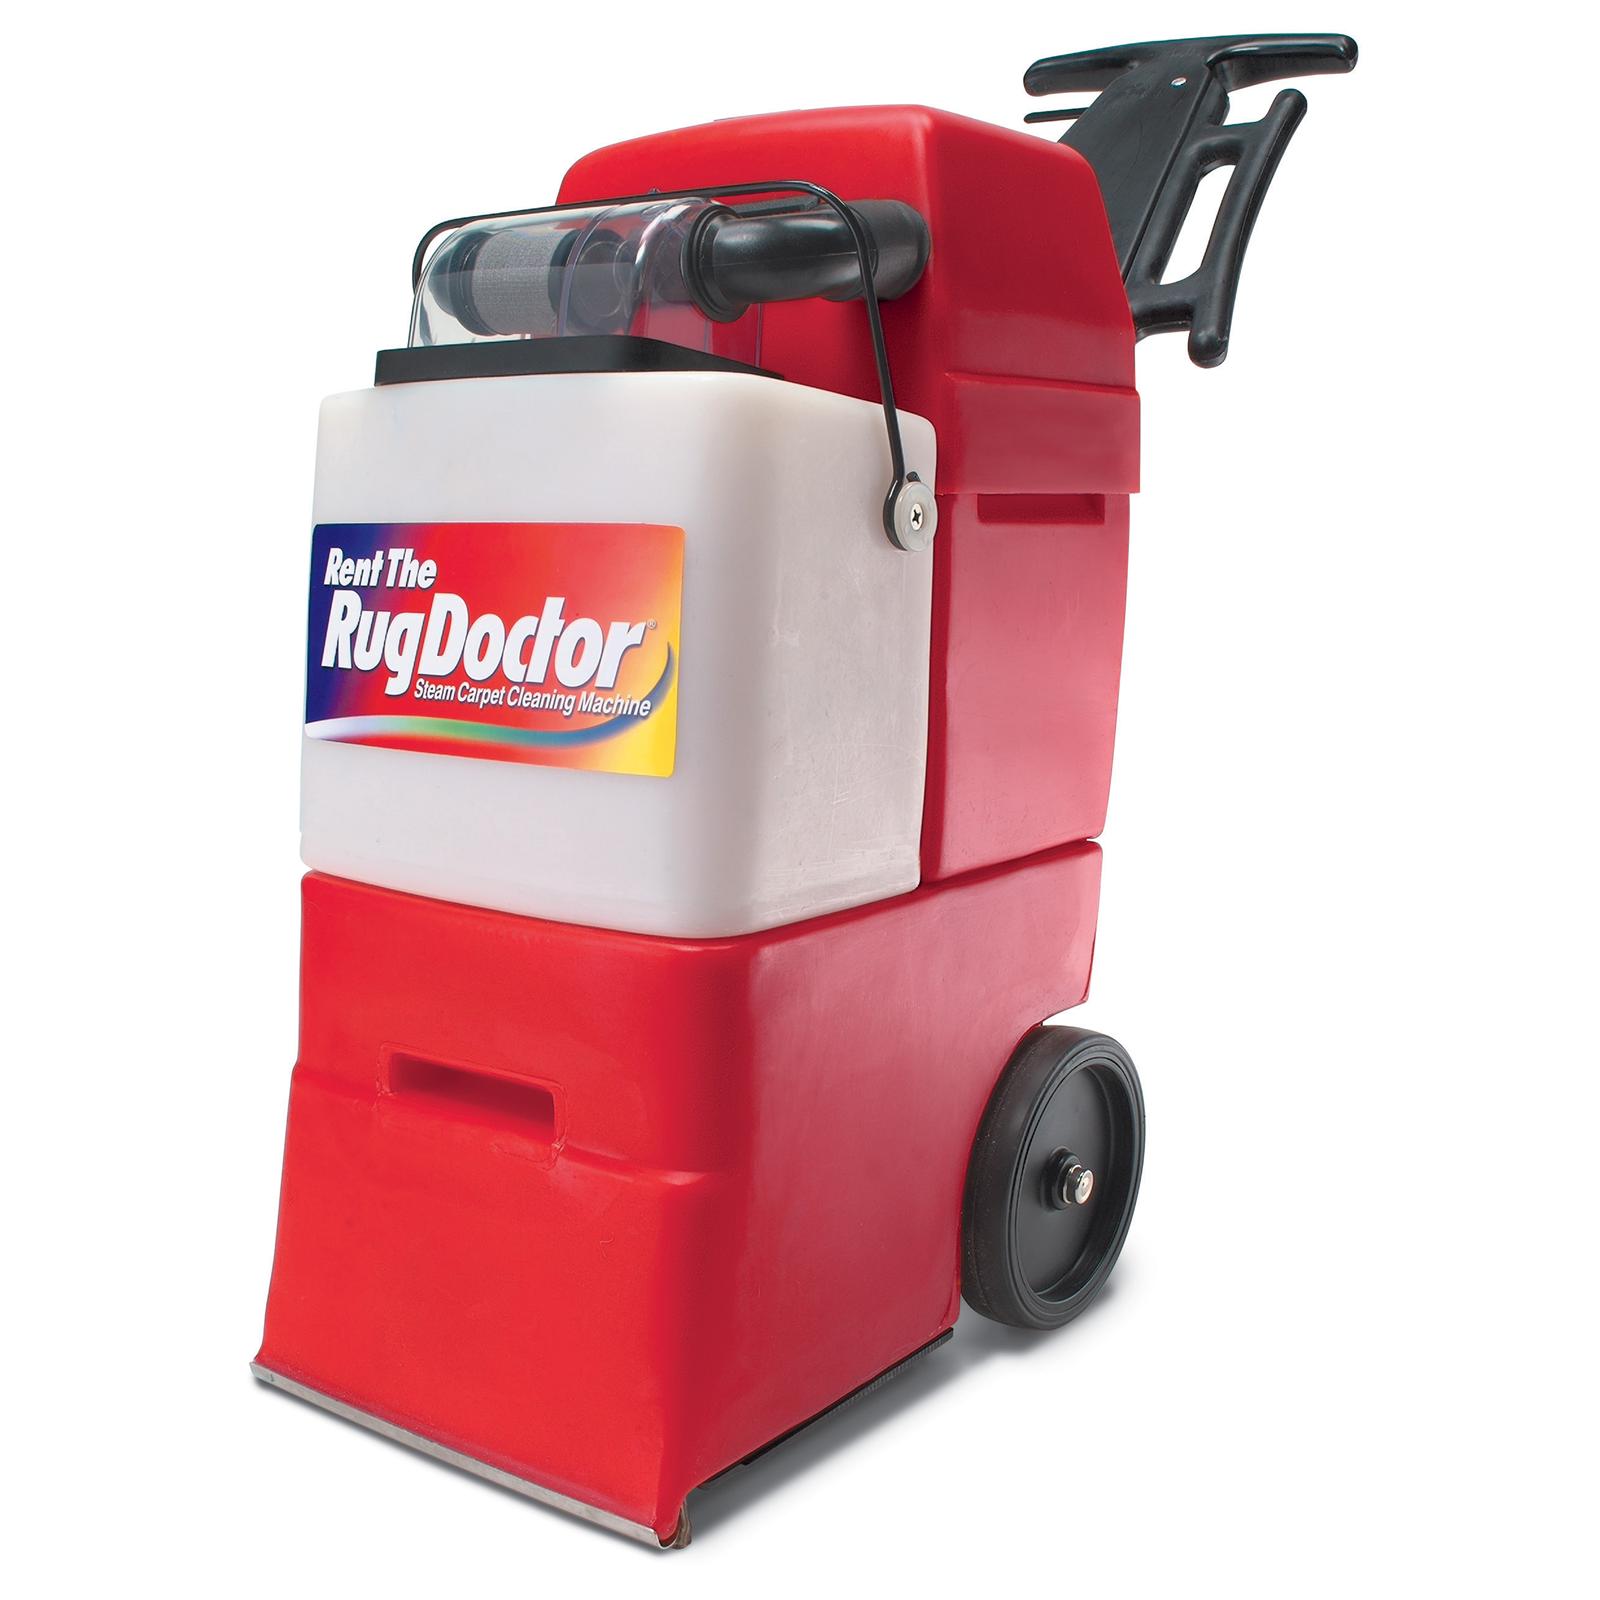 For Hire: Rug Doctor Carpet Cleaner - 48hr